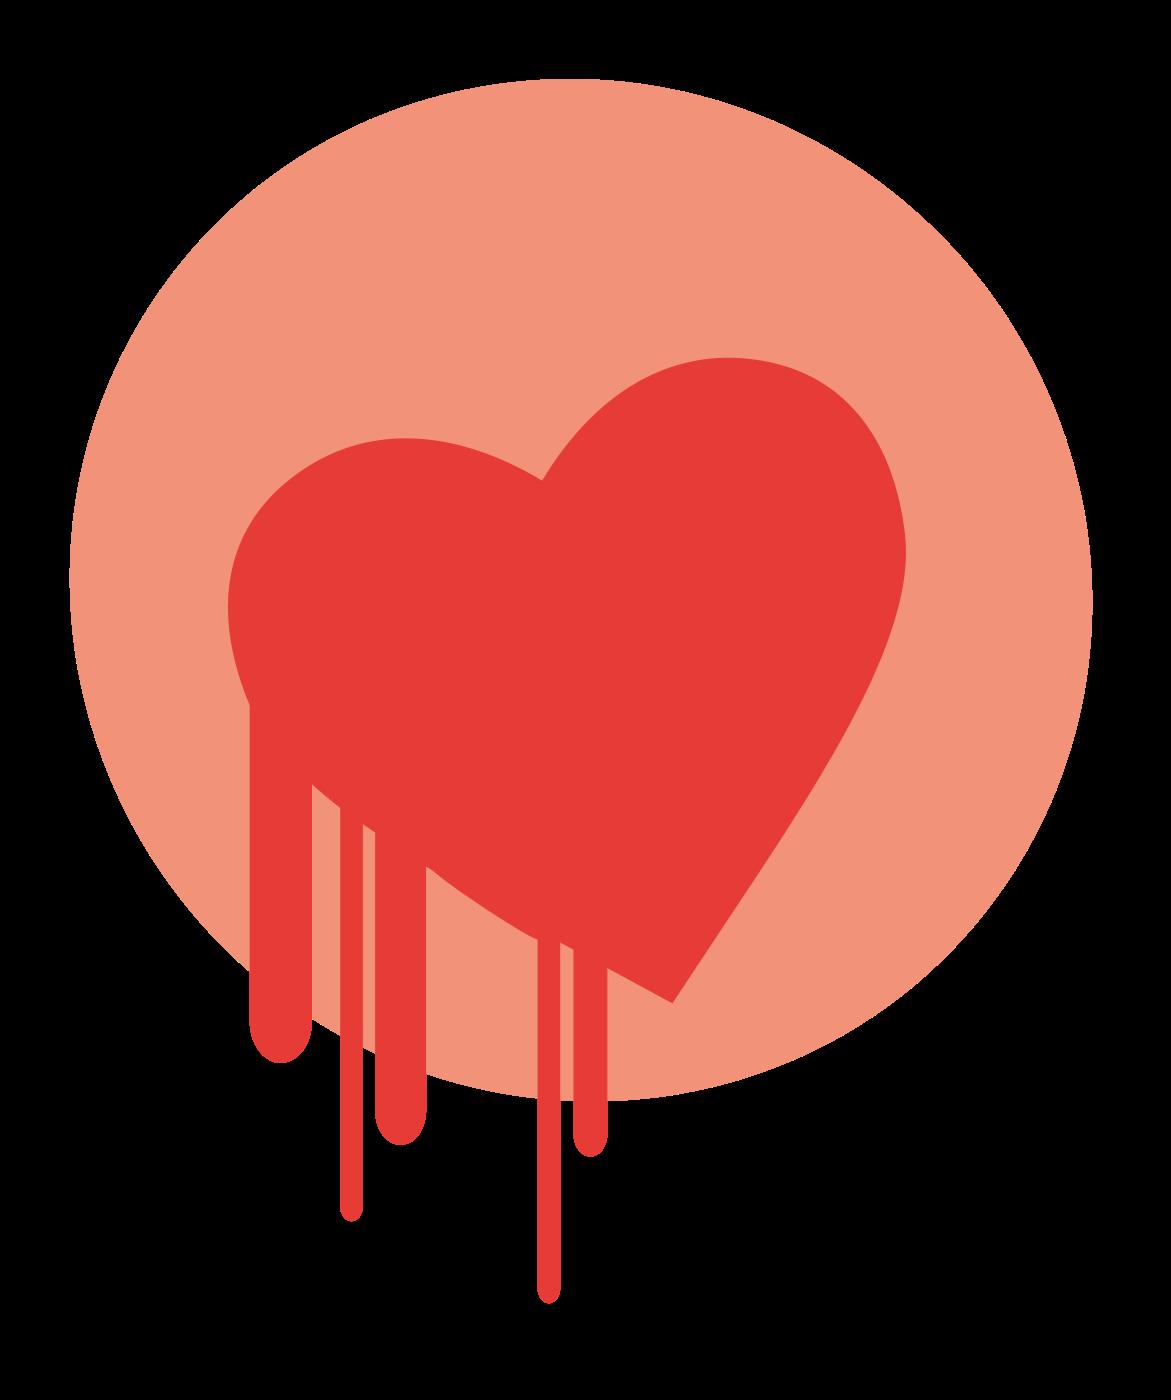 Liefdesverdrietpsycholoog